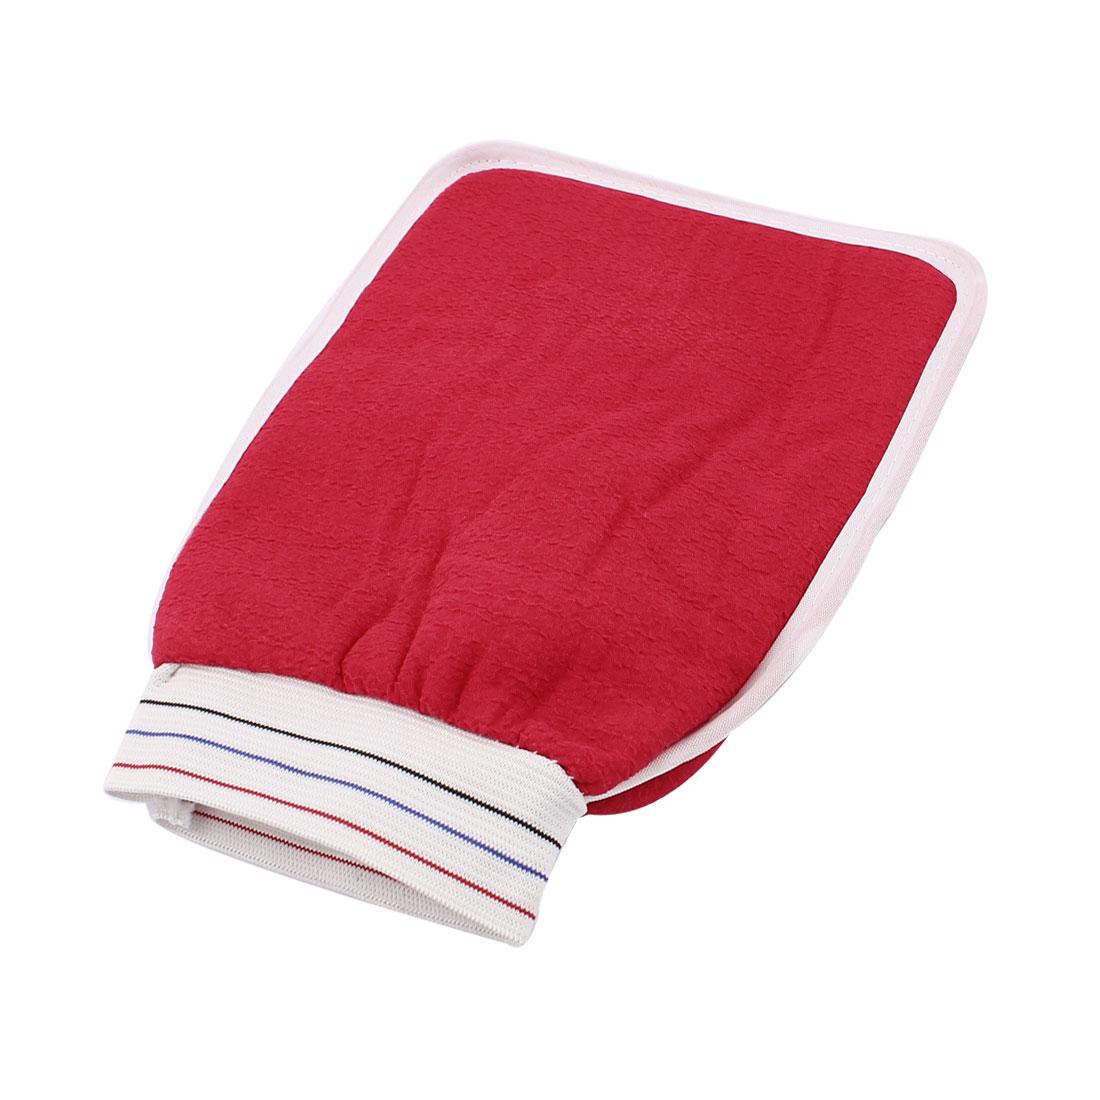 Elastic Cuff Double Side Shower Bath Washing Massage Glove Scrubber Red